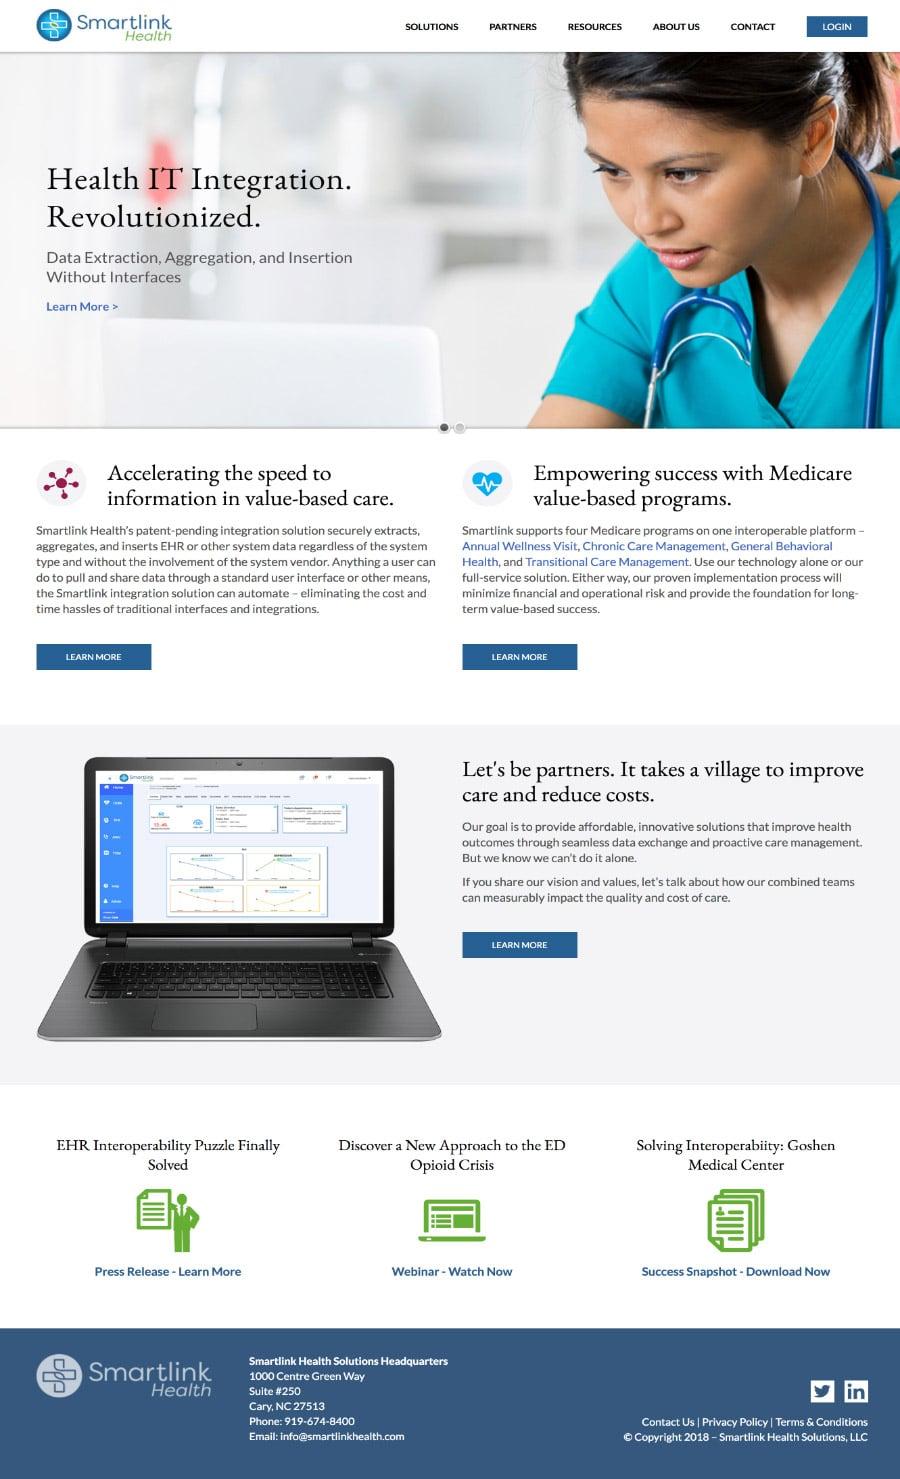 Smartlink Health home page